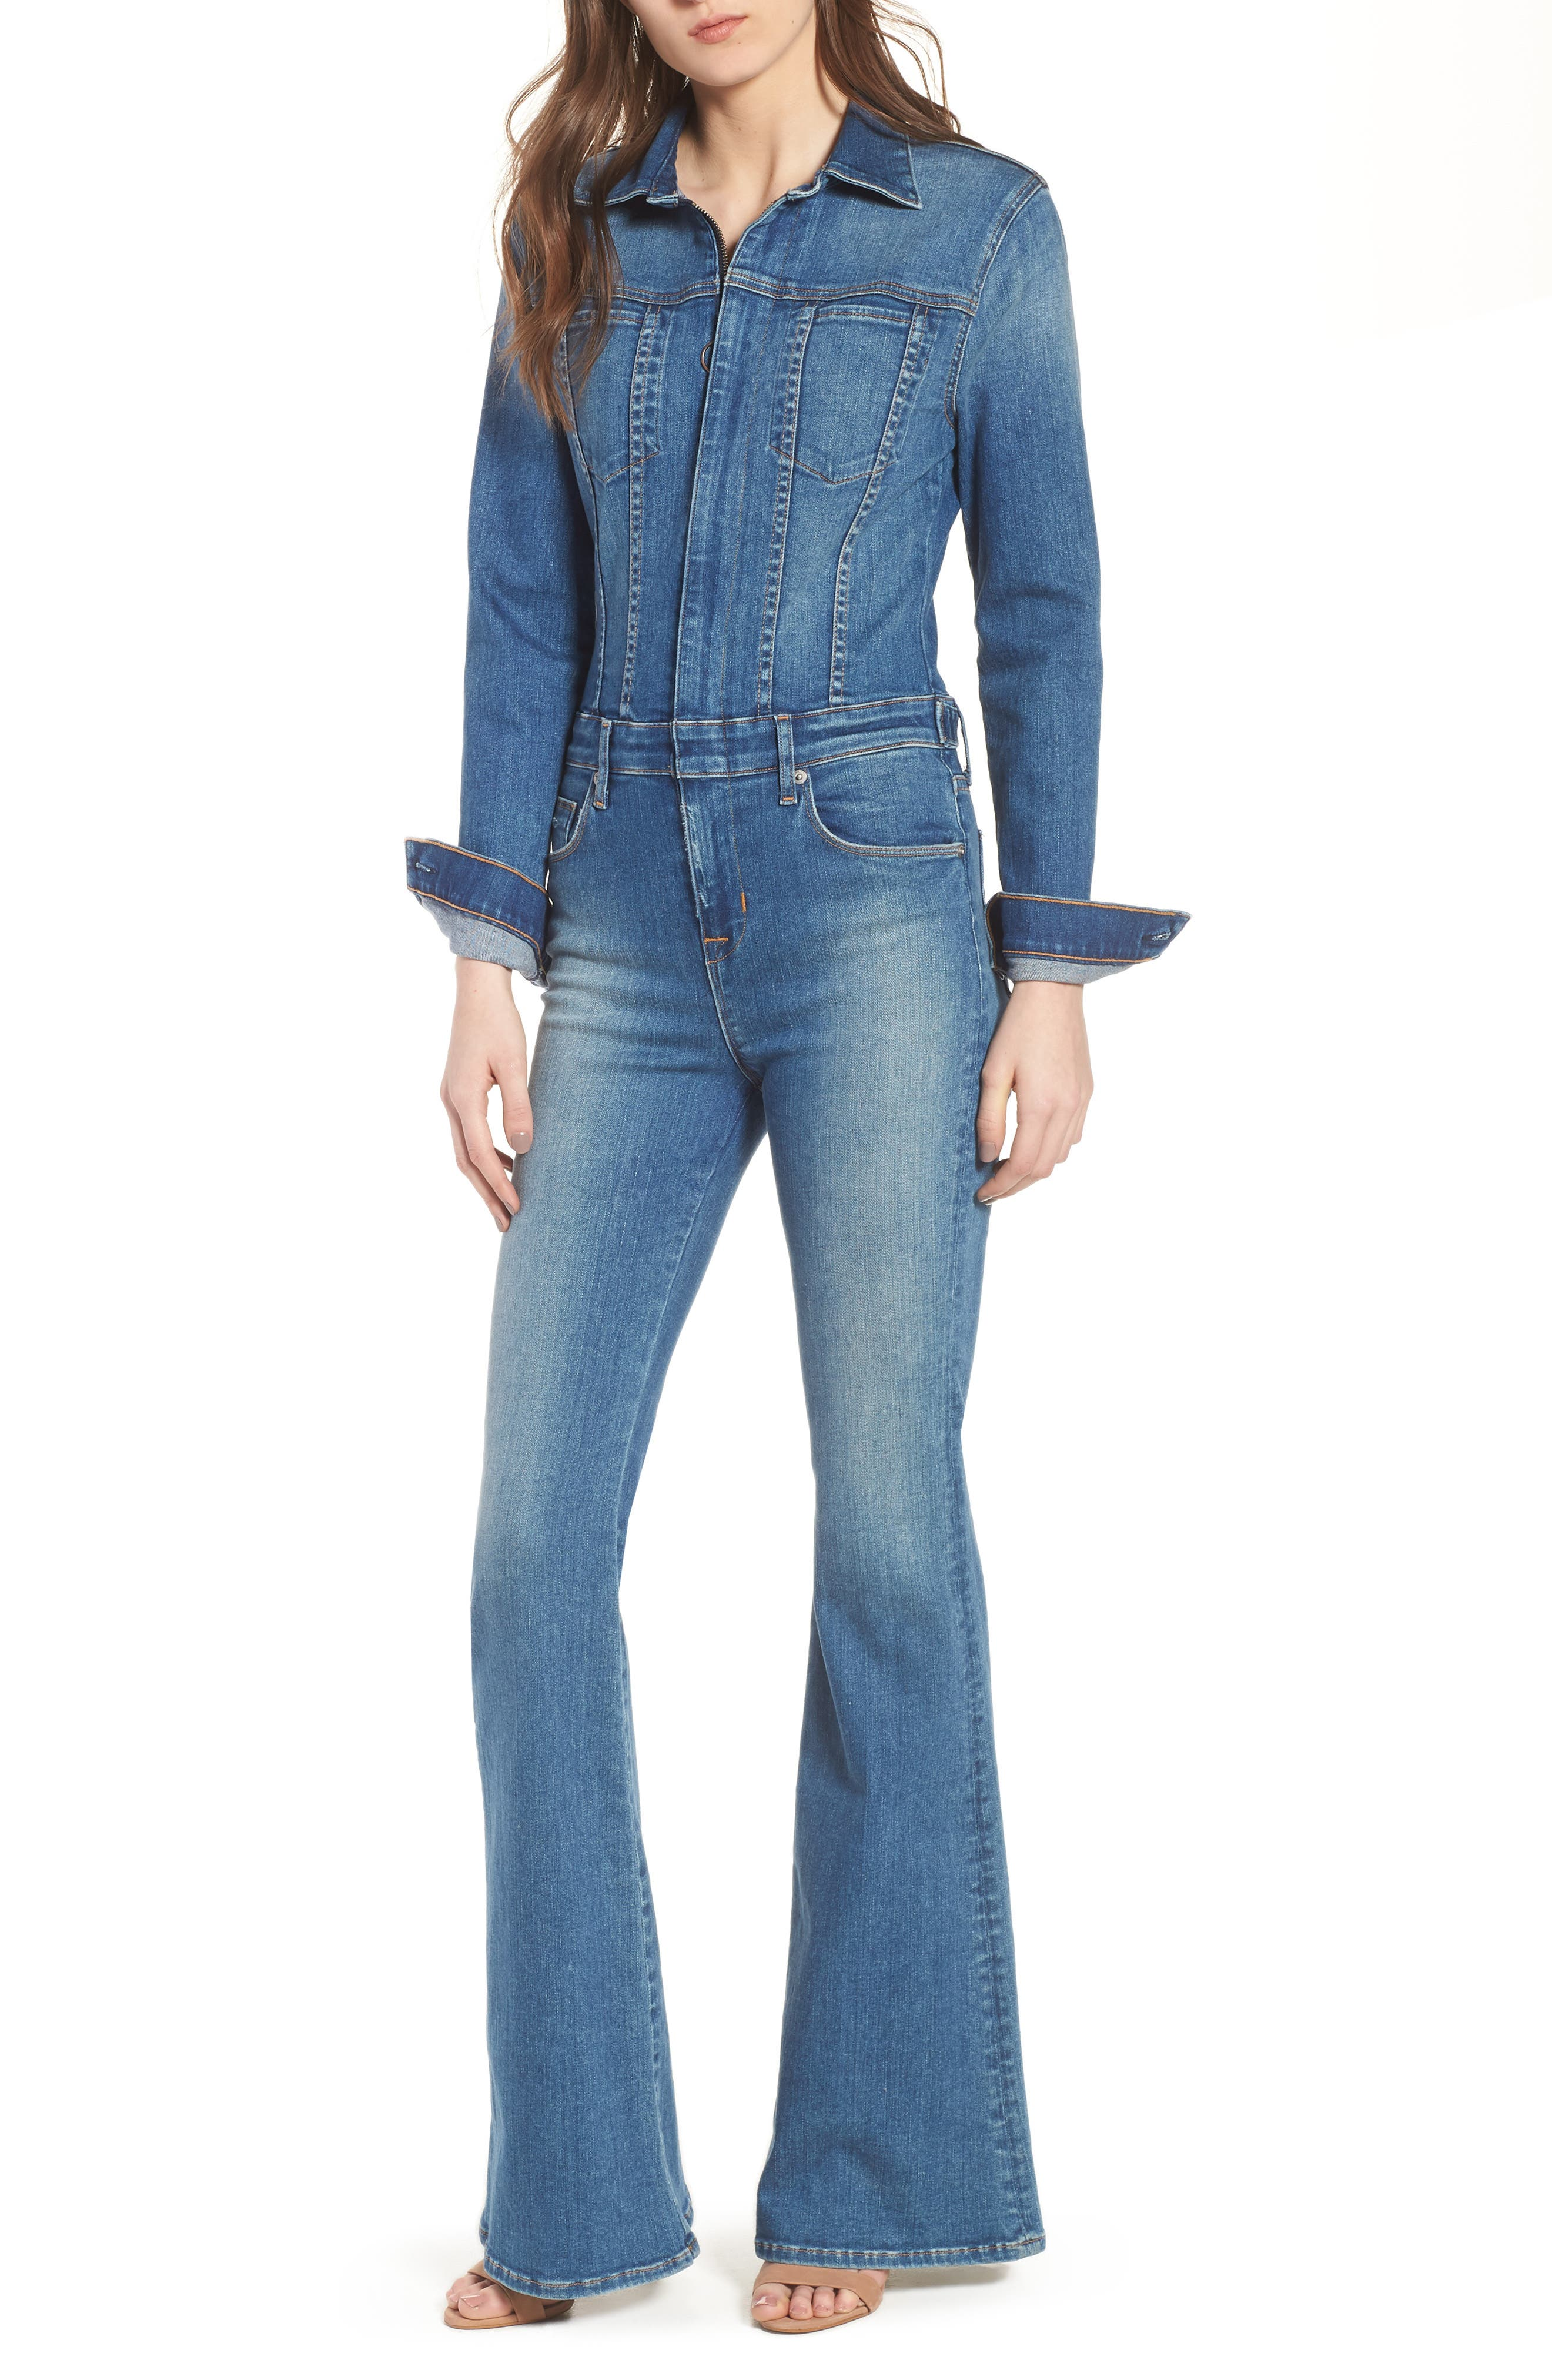 Holly Long Sleeve Coveralls,                         Main,                         color, Rambler